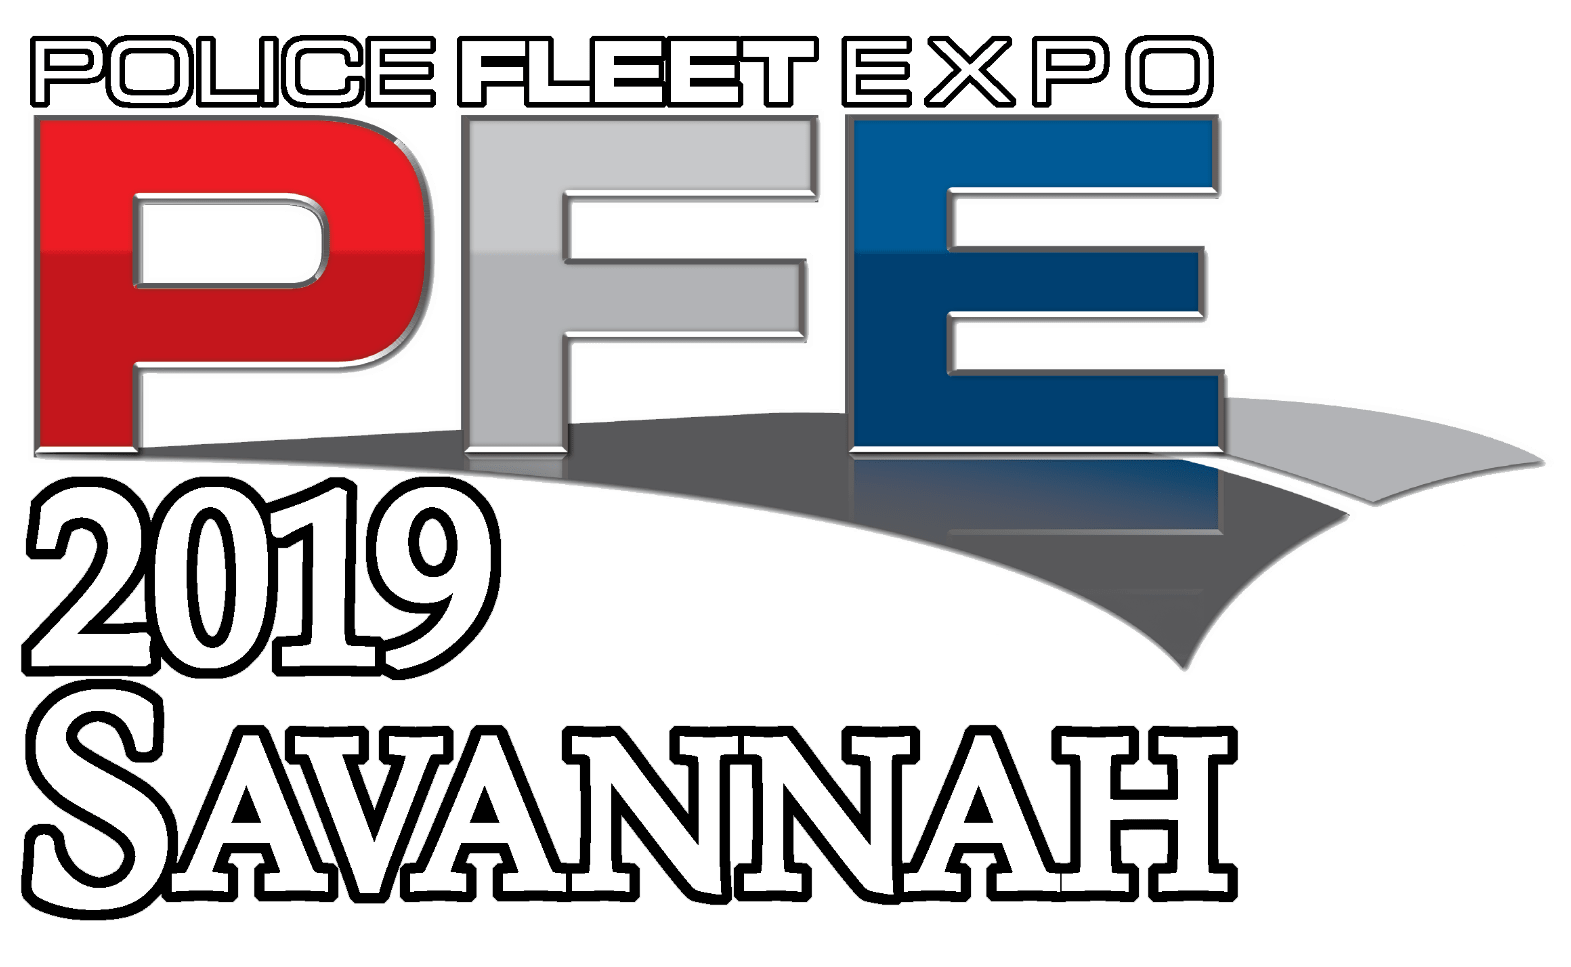 Travel & Lodging   Police Fleet Expo 2019